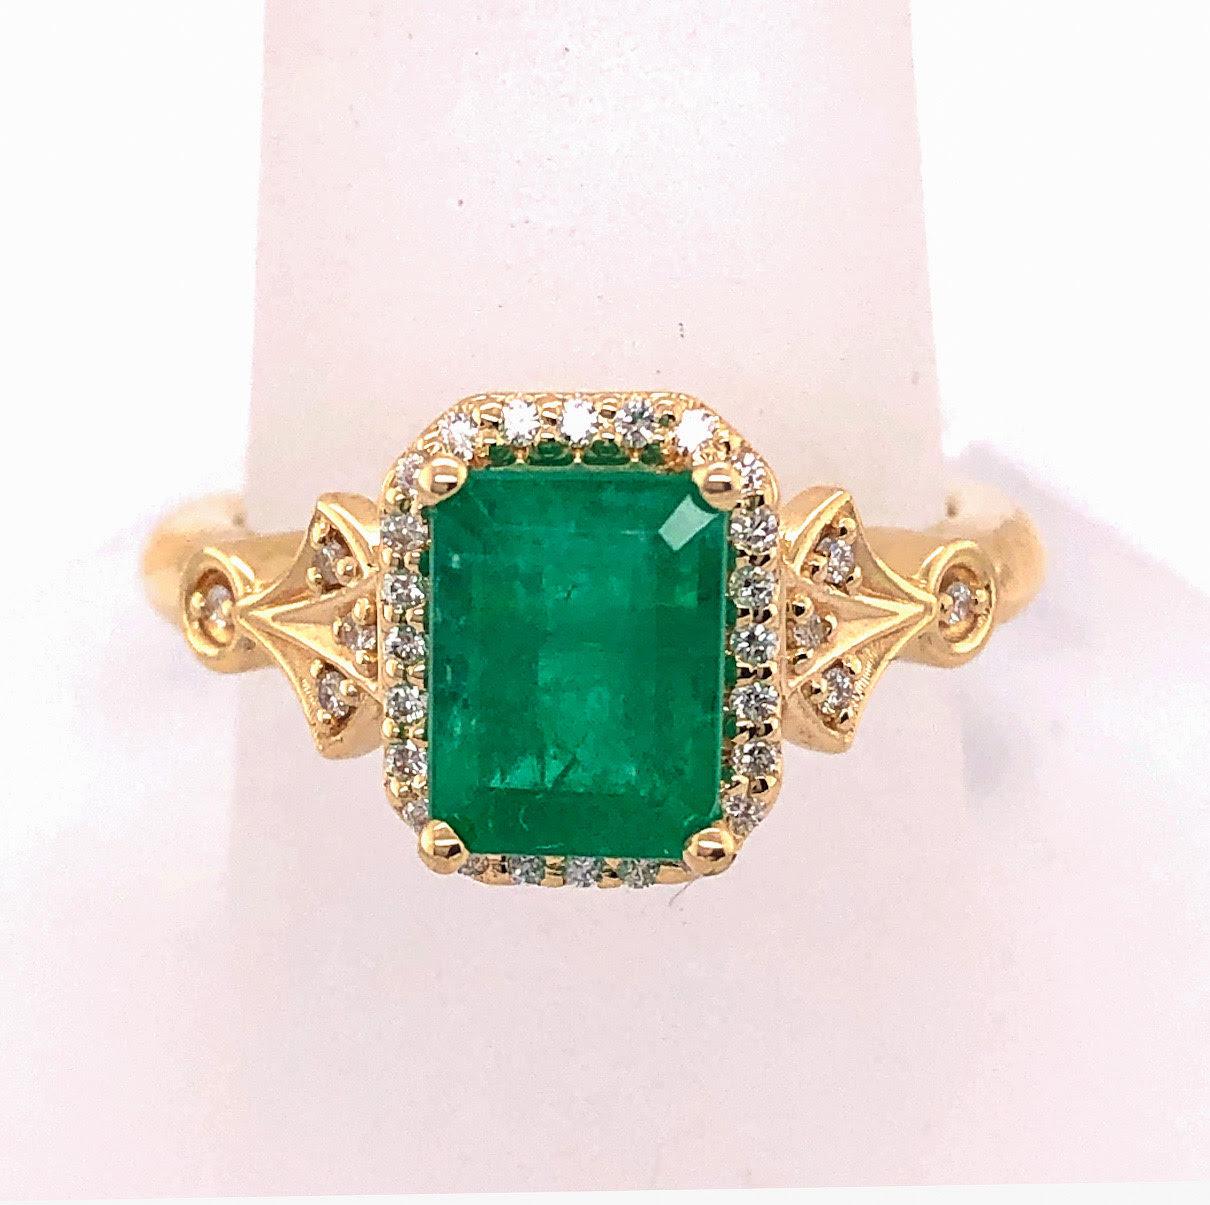 Jewelry Of Joy Hand Crafted Jewelry